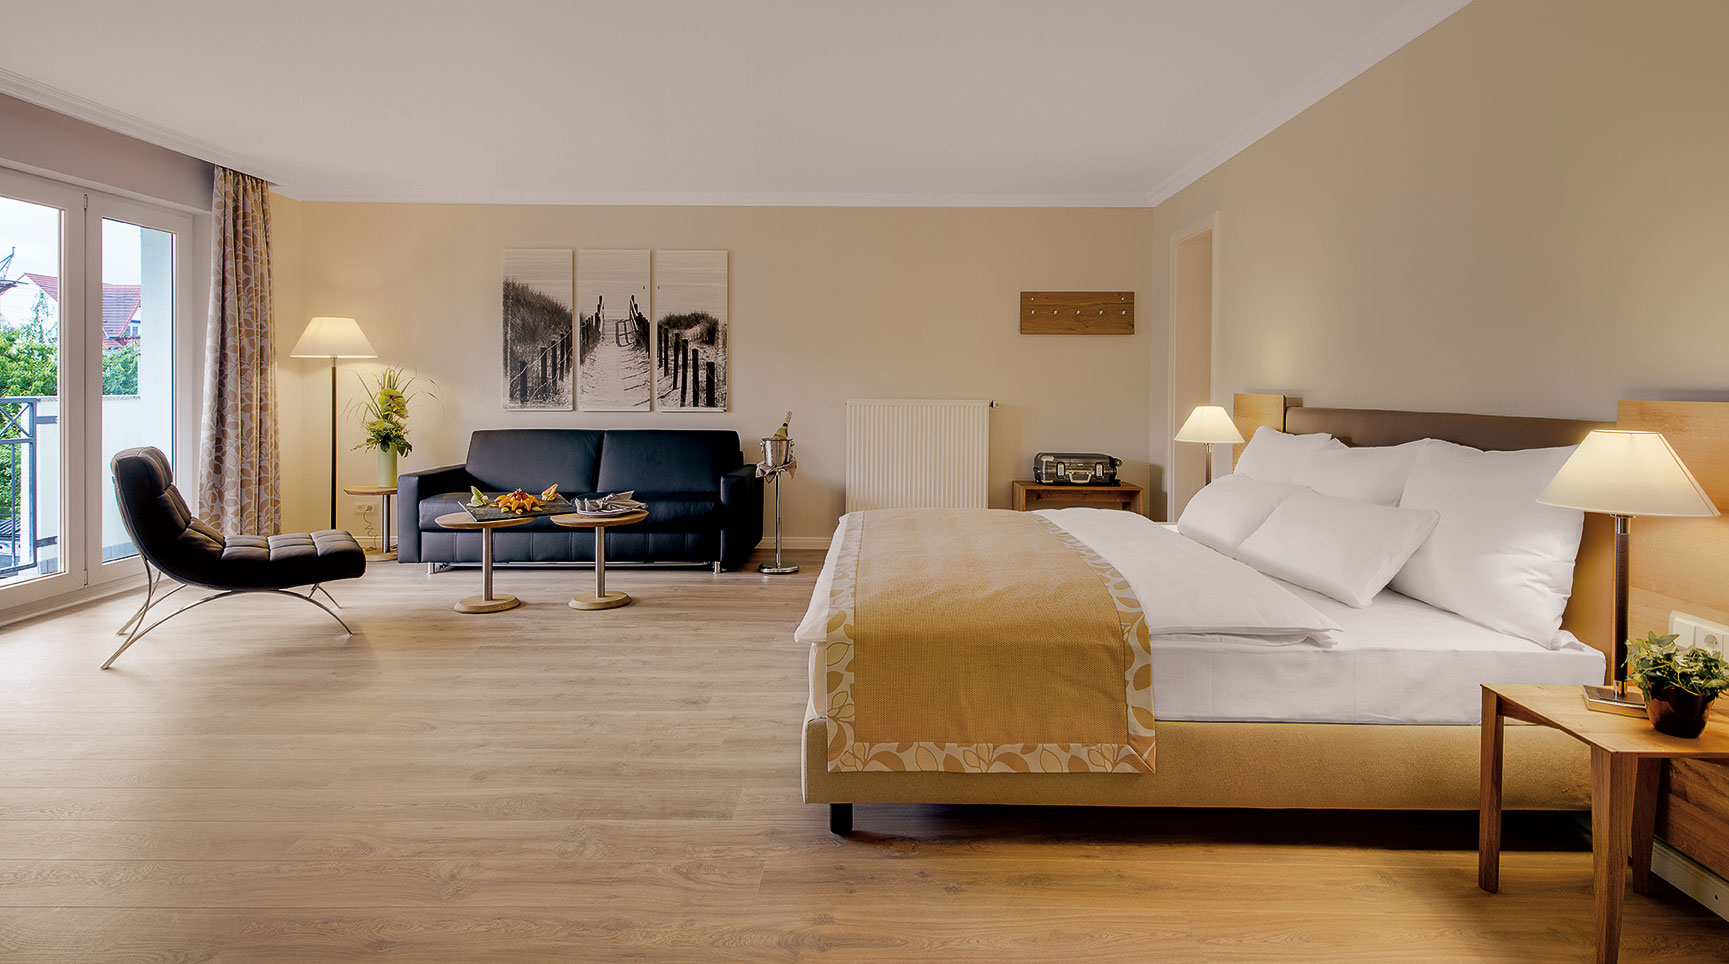 Zimmer hotel villa toskana heidelberg zimmer tagung for Zimmer hotel